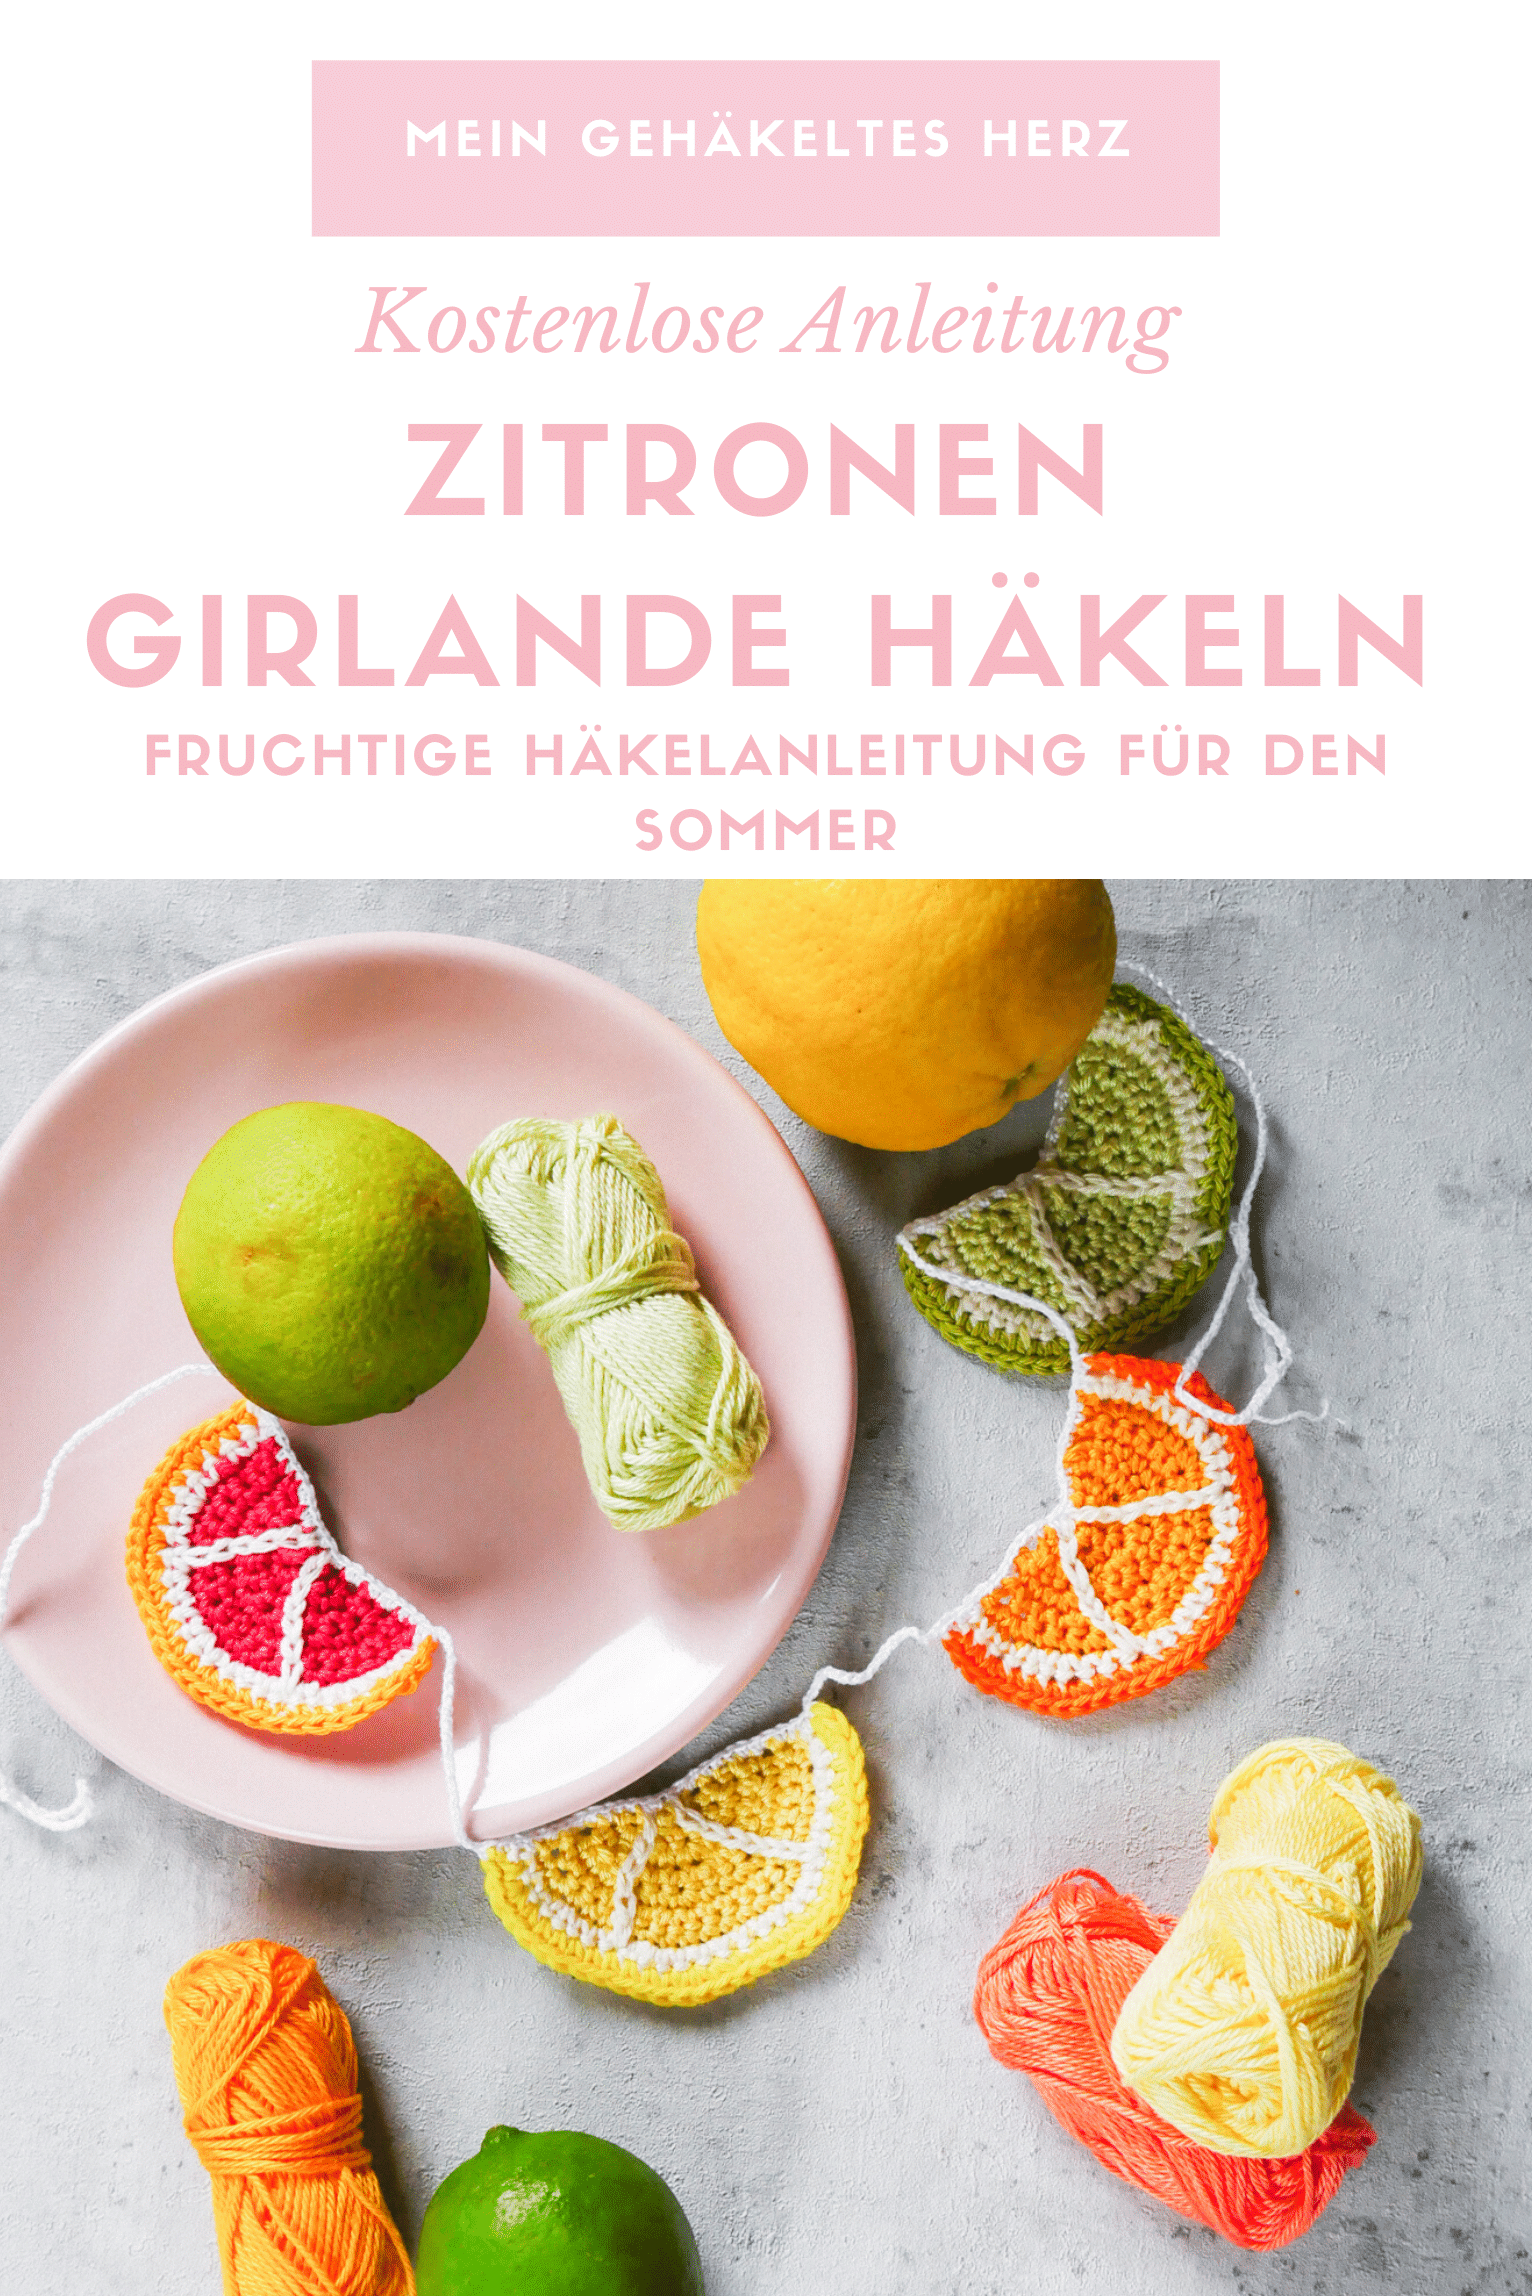 Zitrusfrucht Häkelanleitung Zitrone Limette